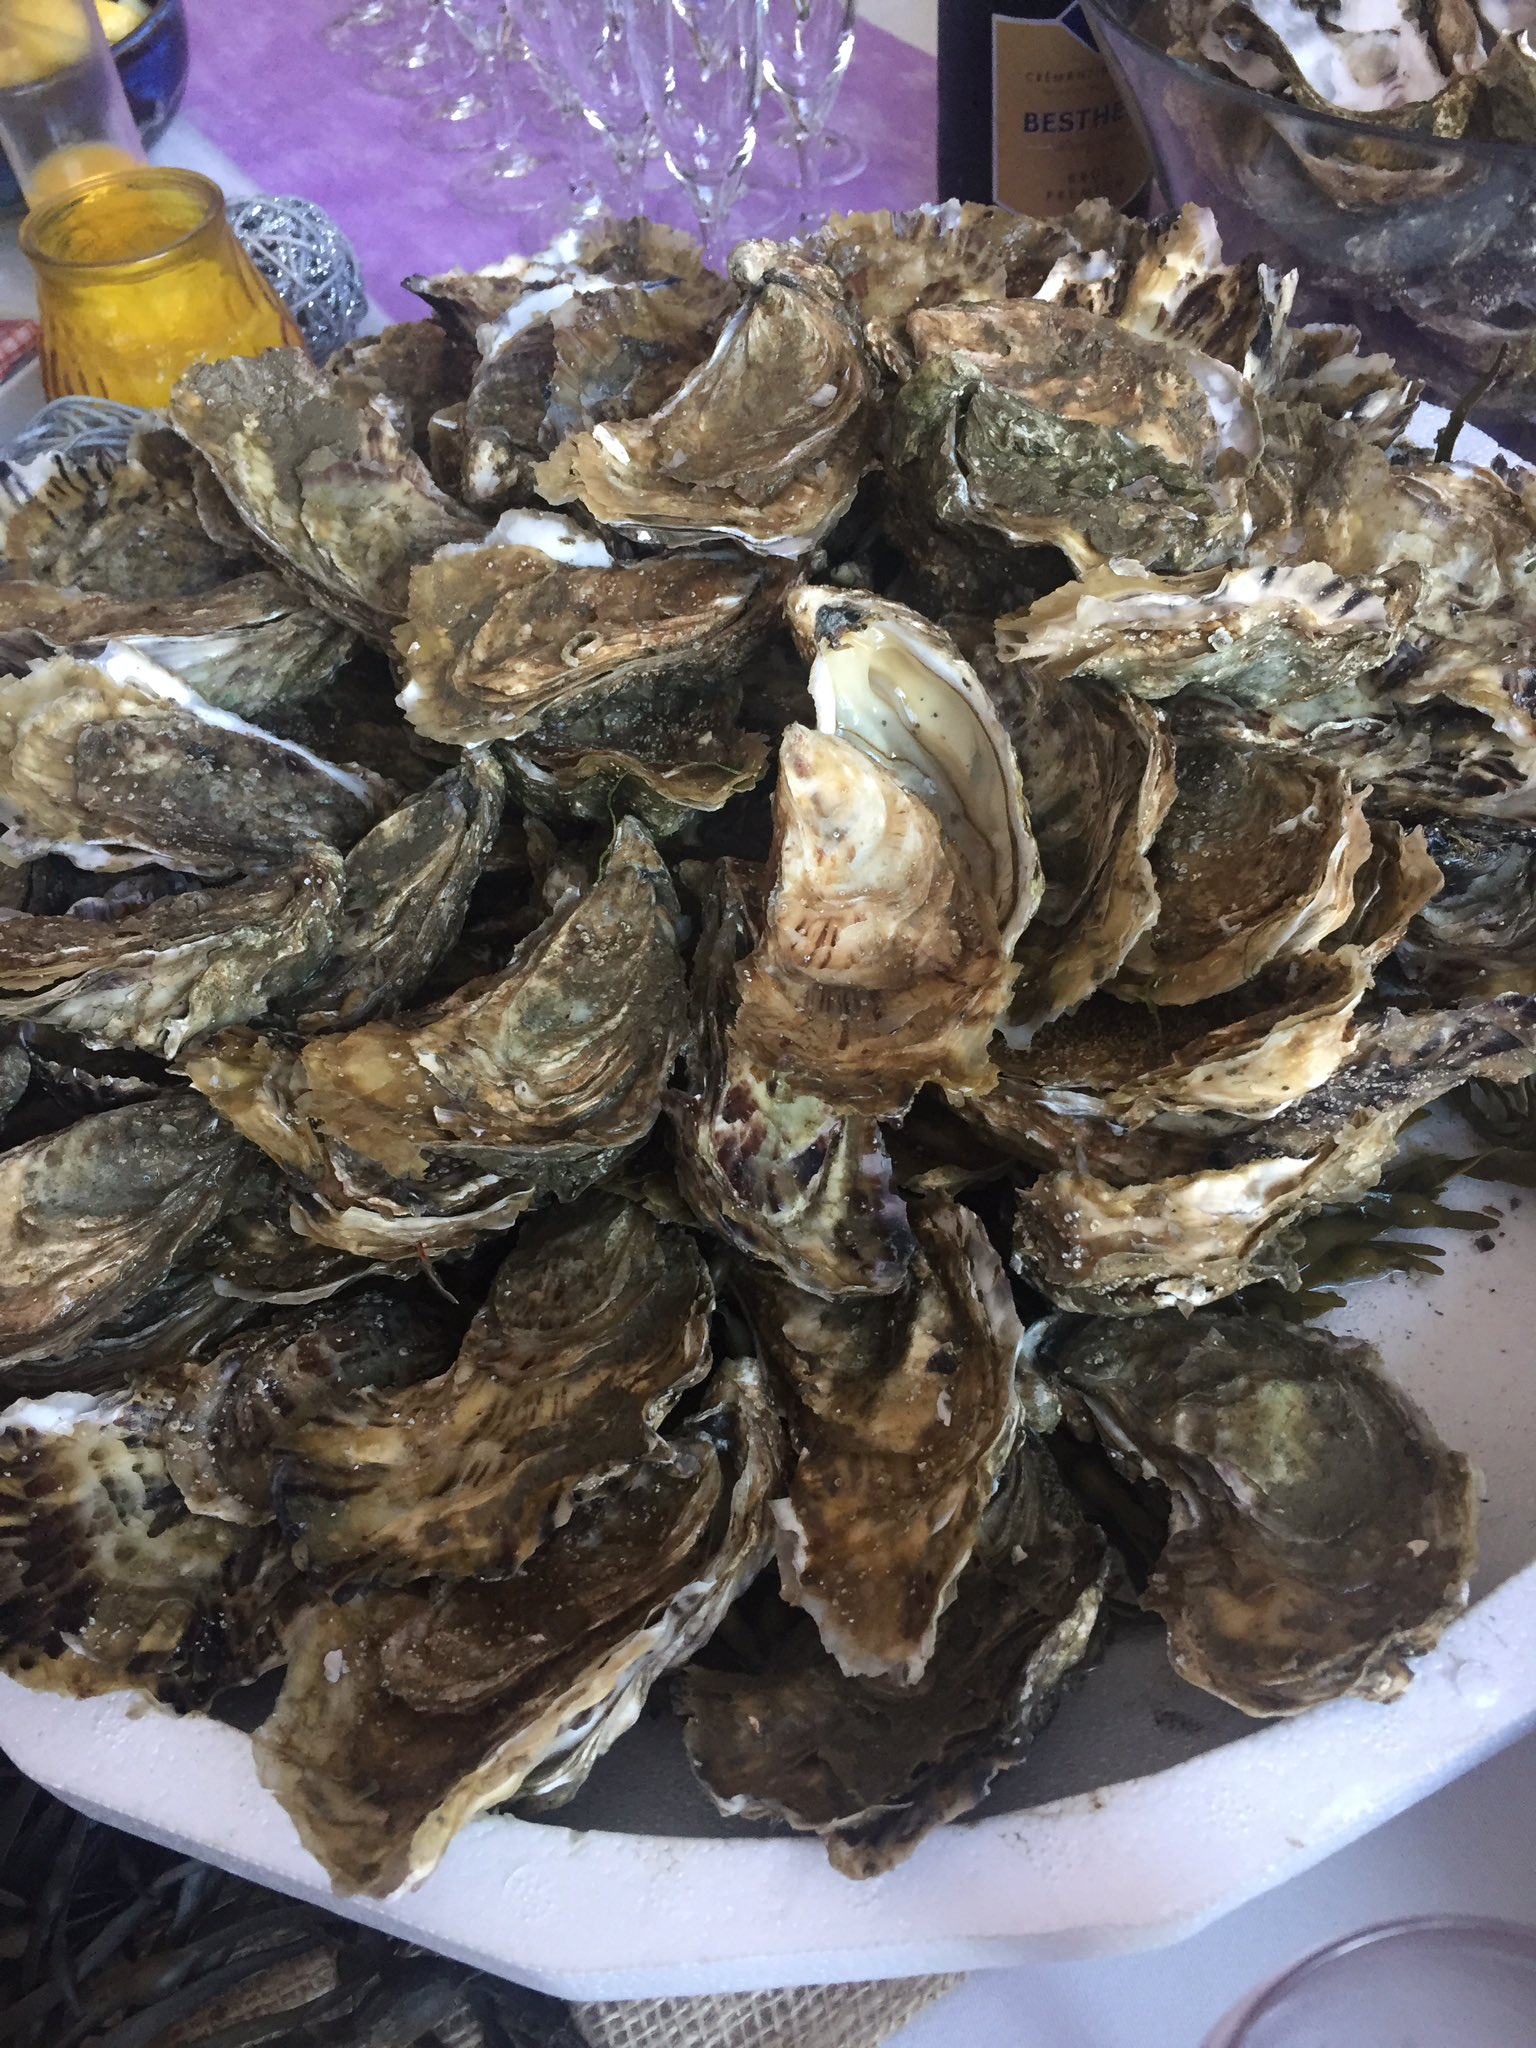 Alerte huîtres au #colloquefcu Cc @frompennylane 😉 https://t.co/8ywAFkgPNU